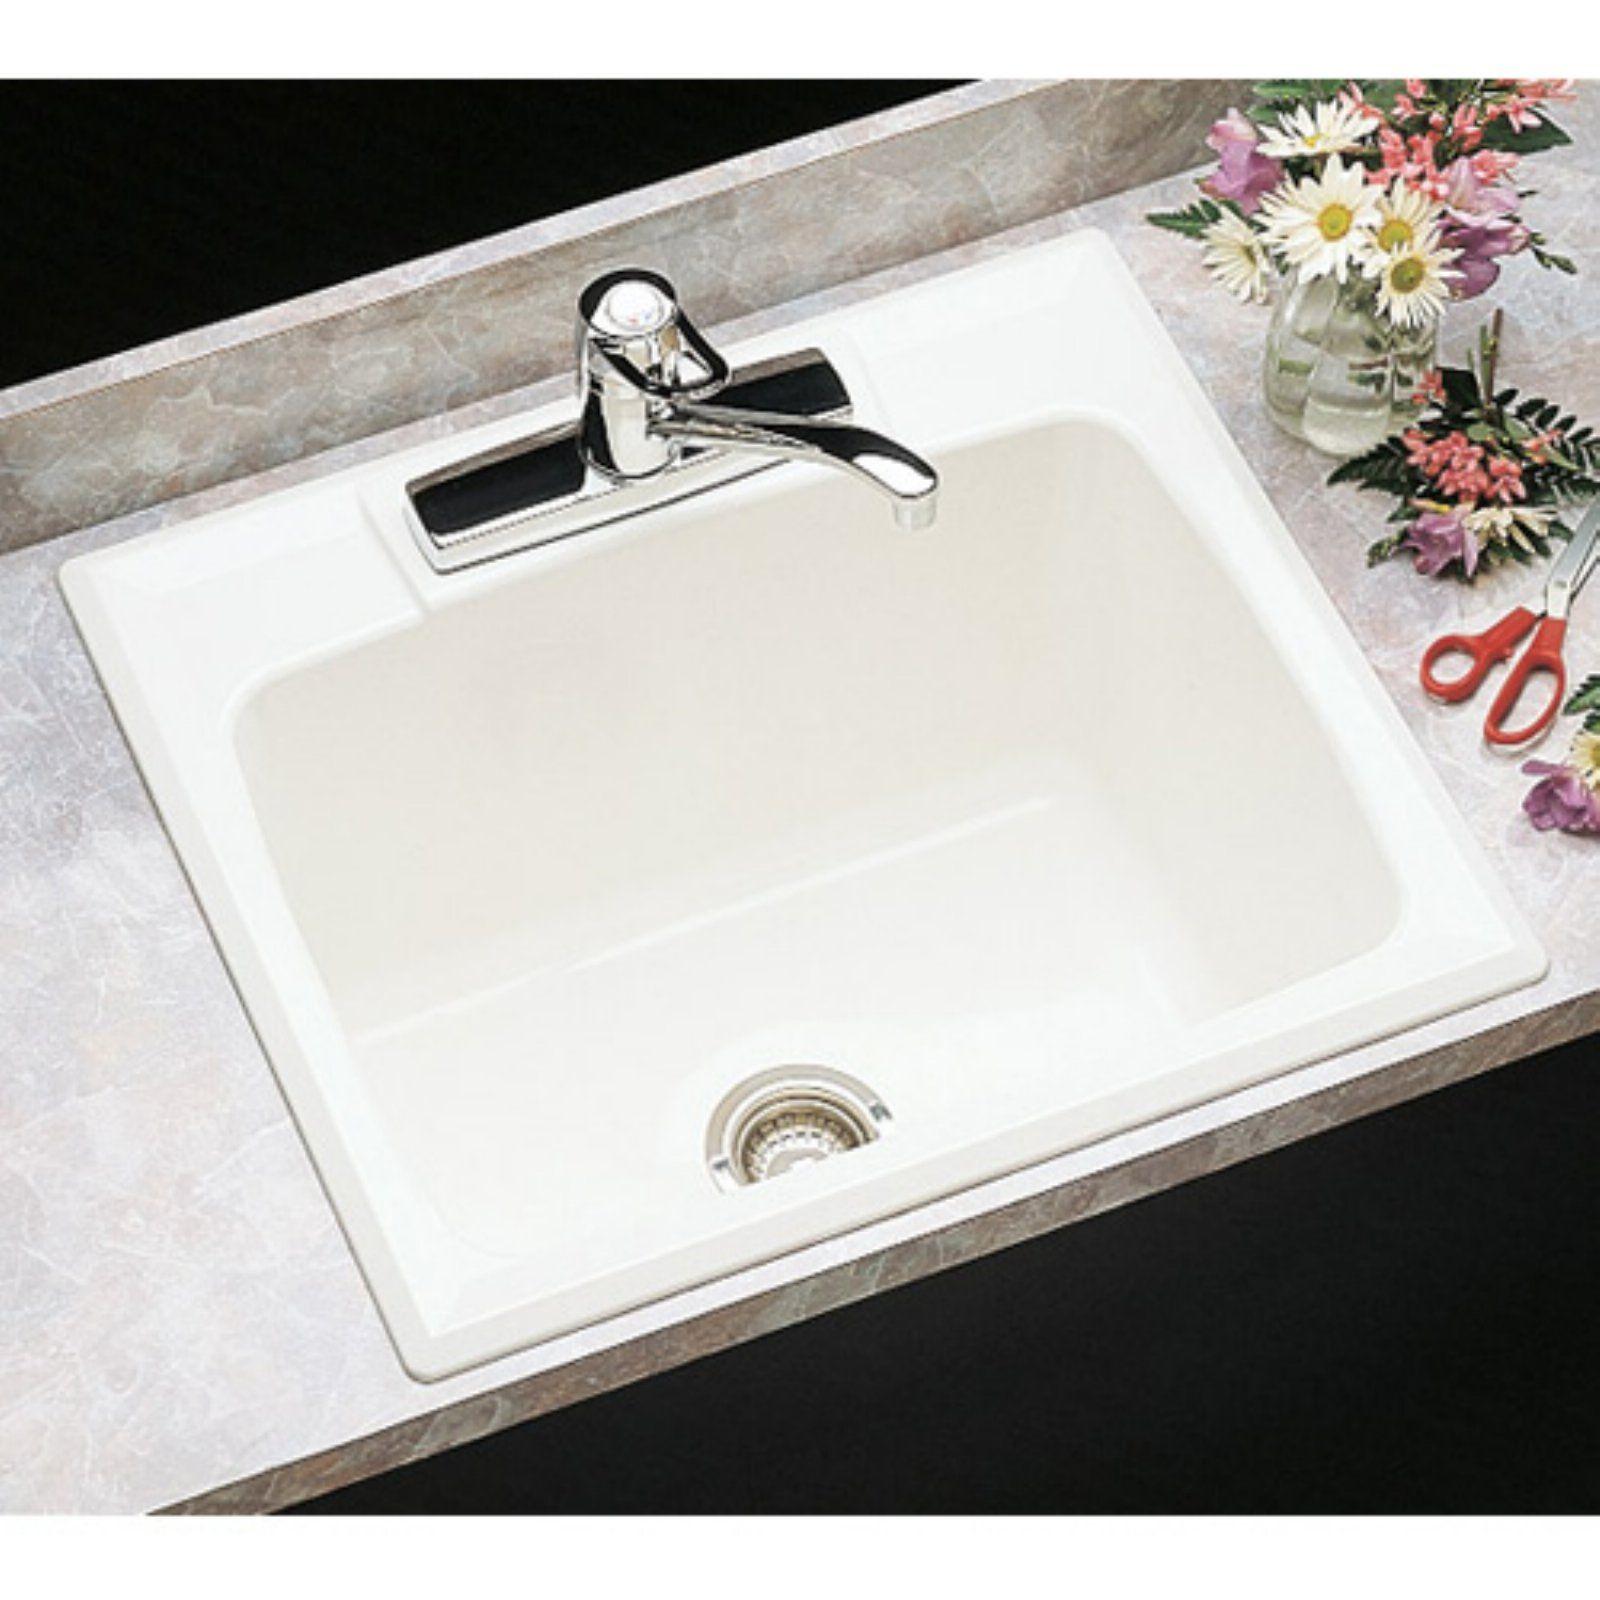 Mustee Durastone 10c Single Basin Drop In Utility Sink Biscuit